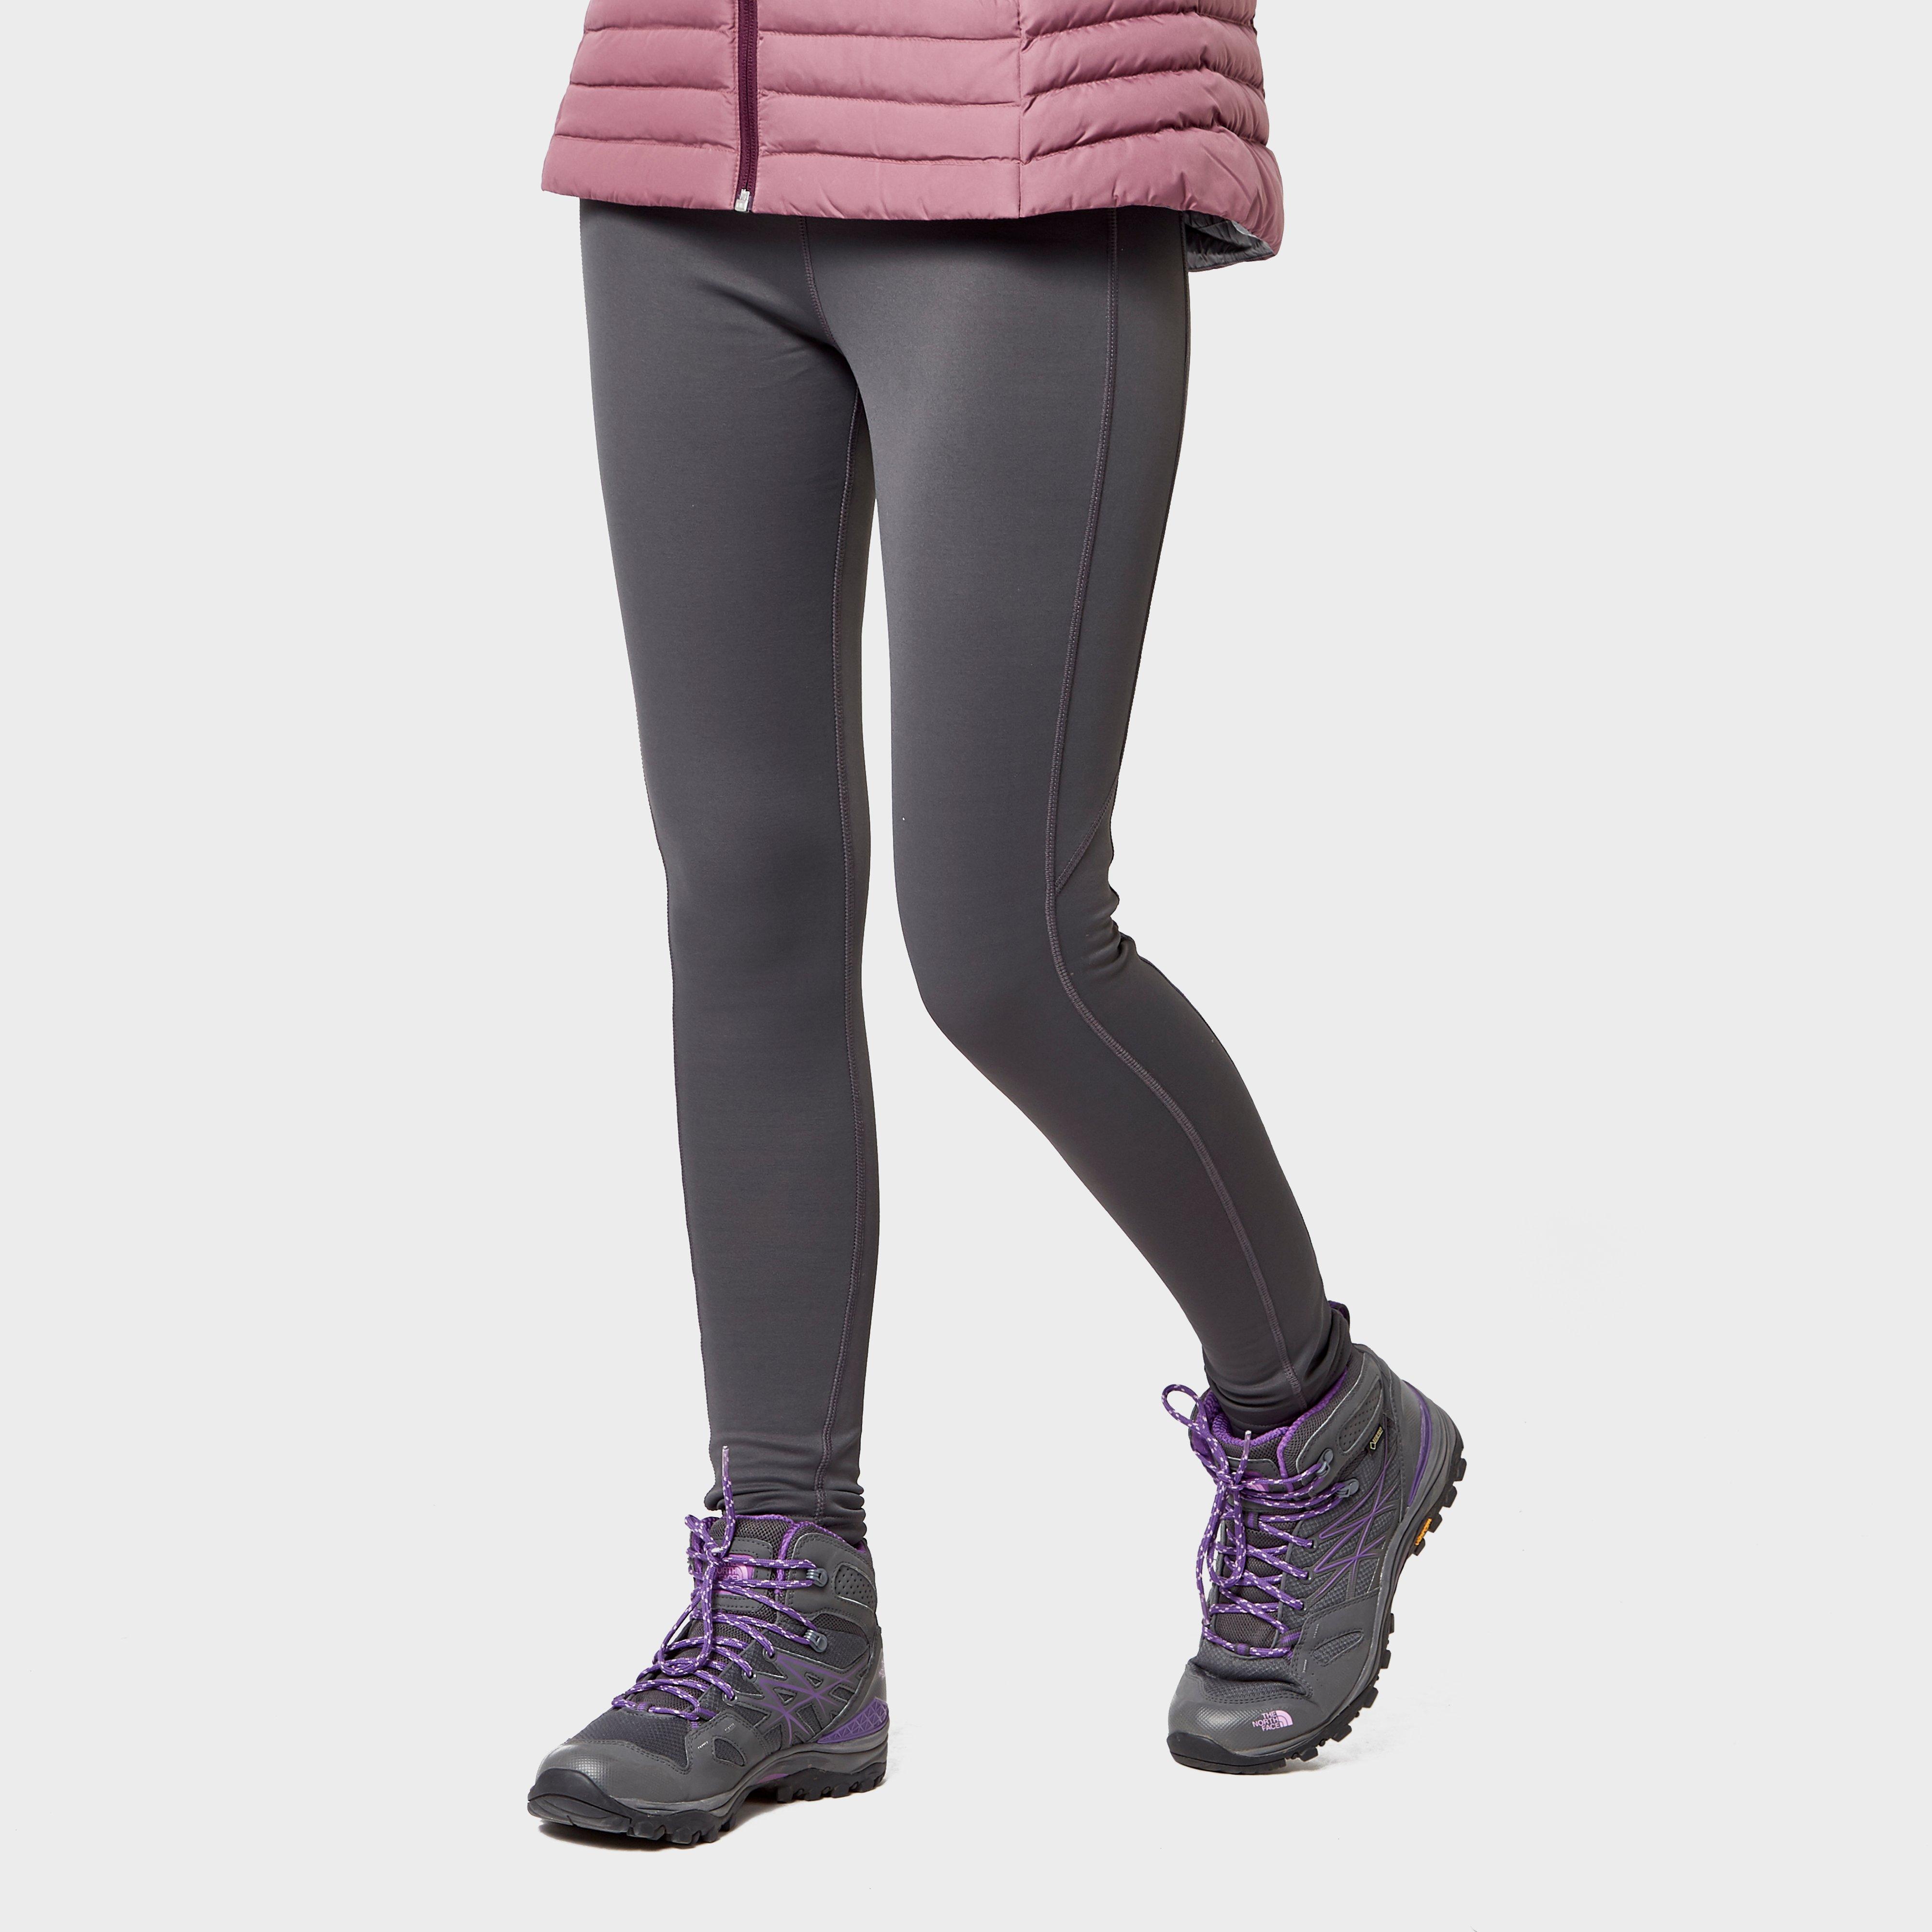 Peter Storm Women's Warmer Leggings - Grey, Grey